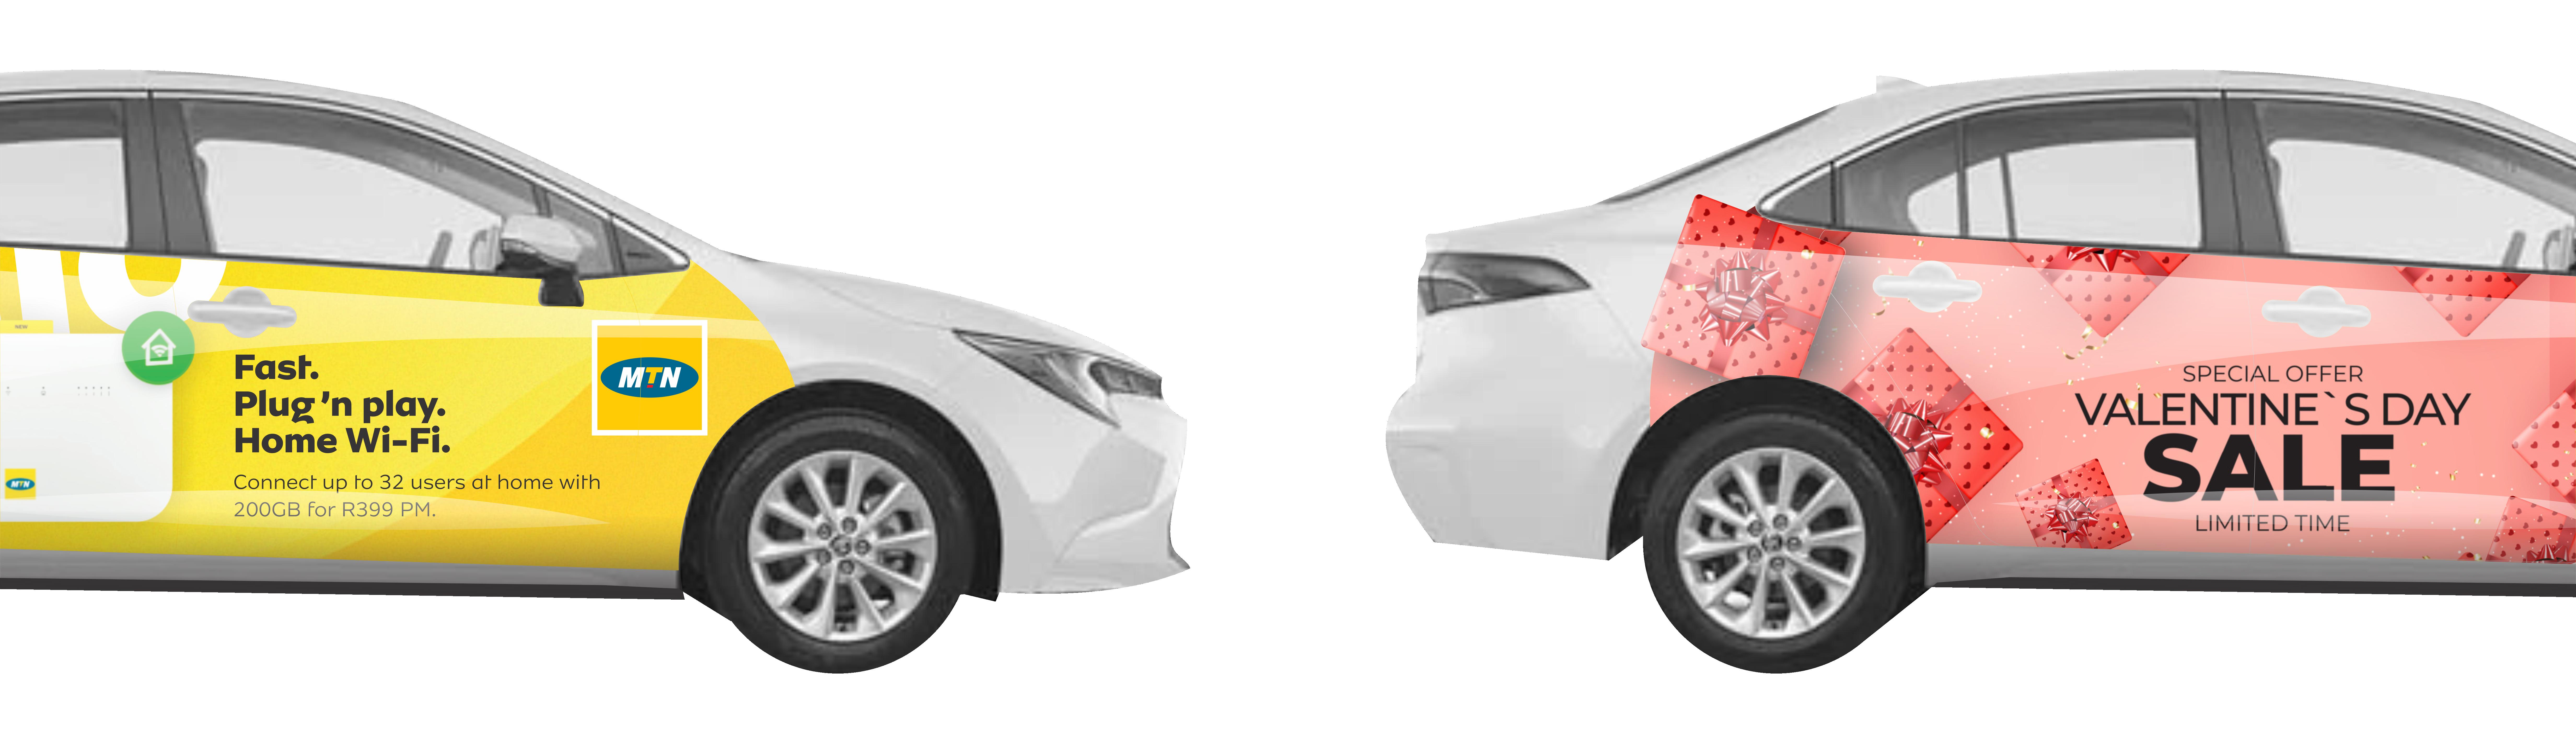 CARS FRONT BLUR